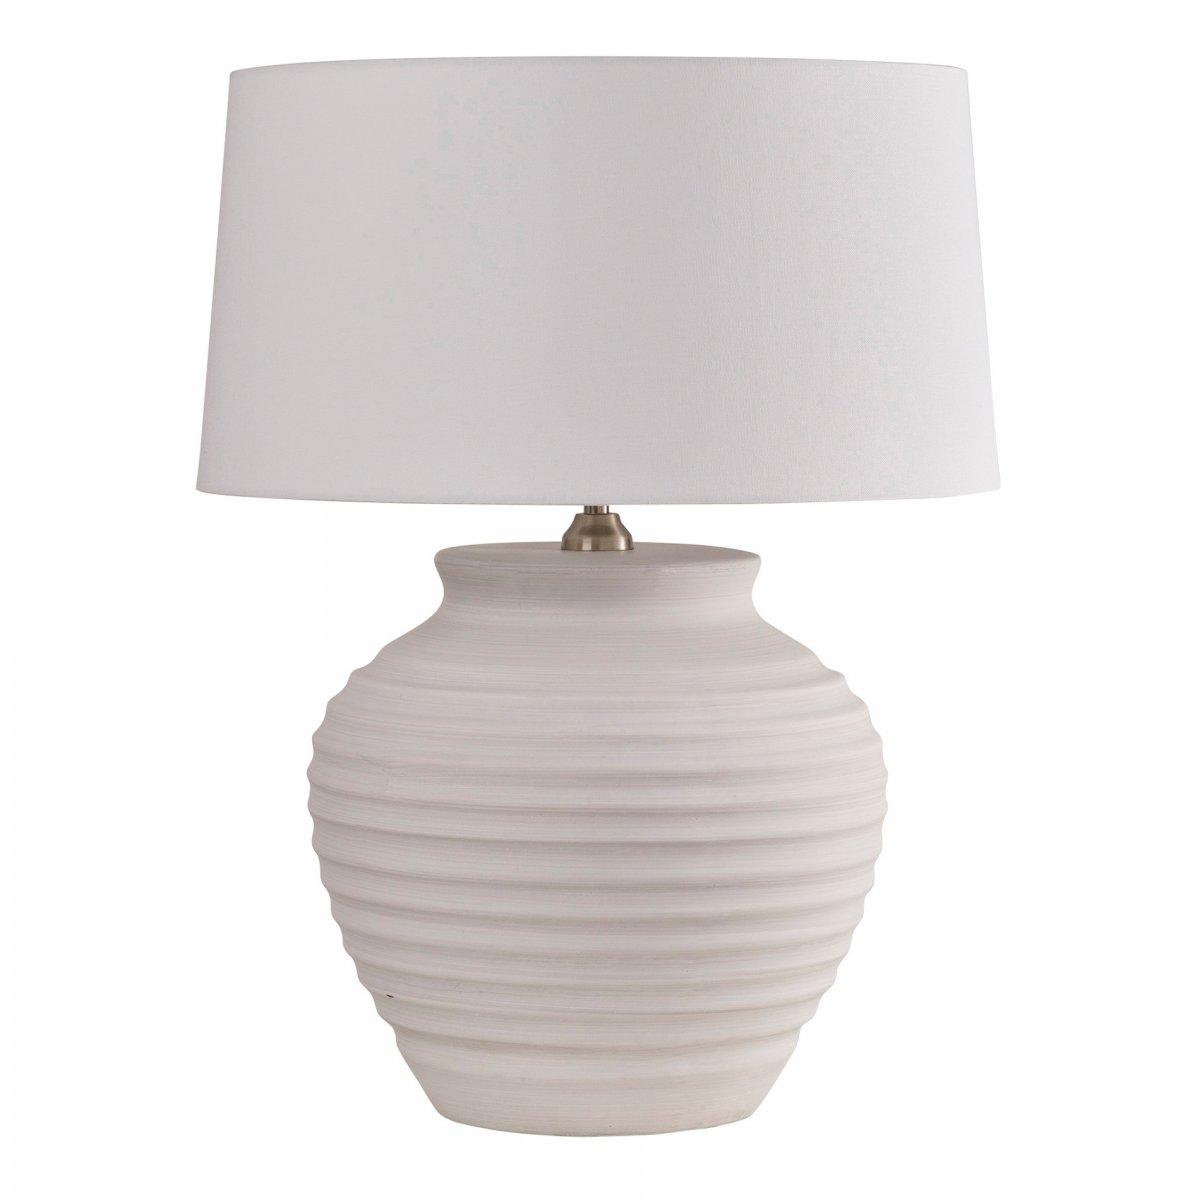 Durban Lamp By Oak Furniture Land